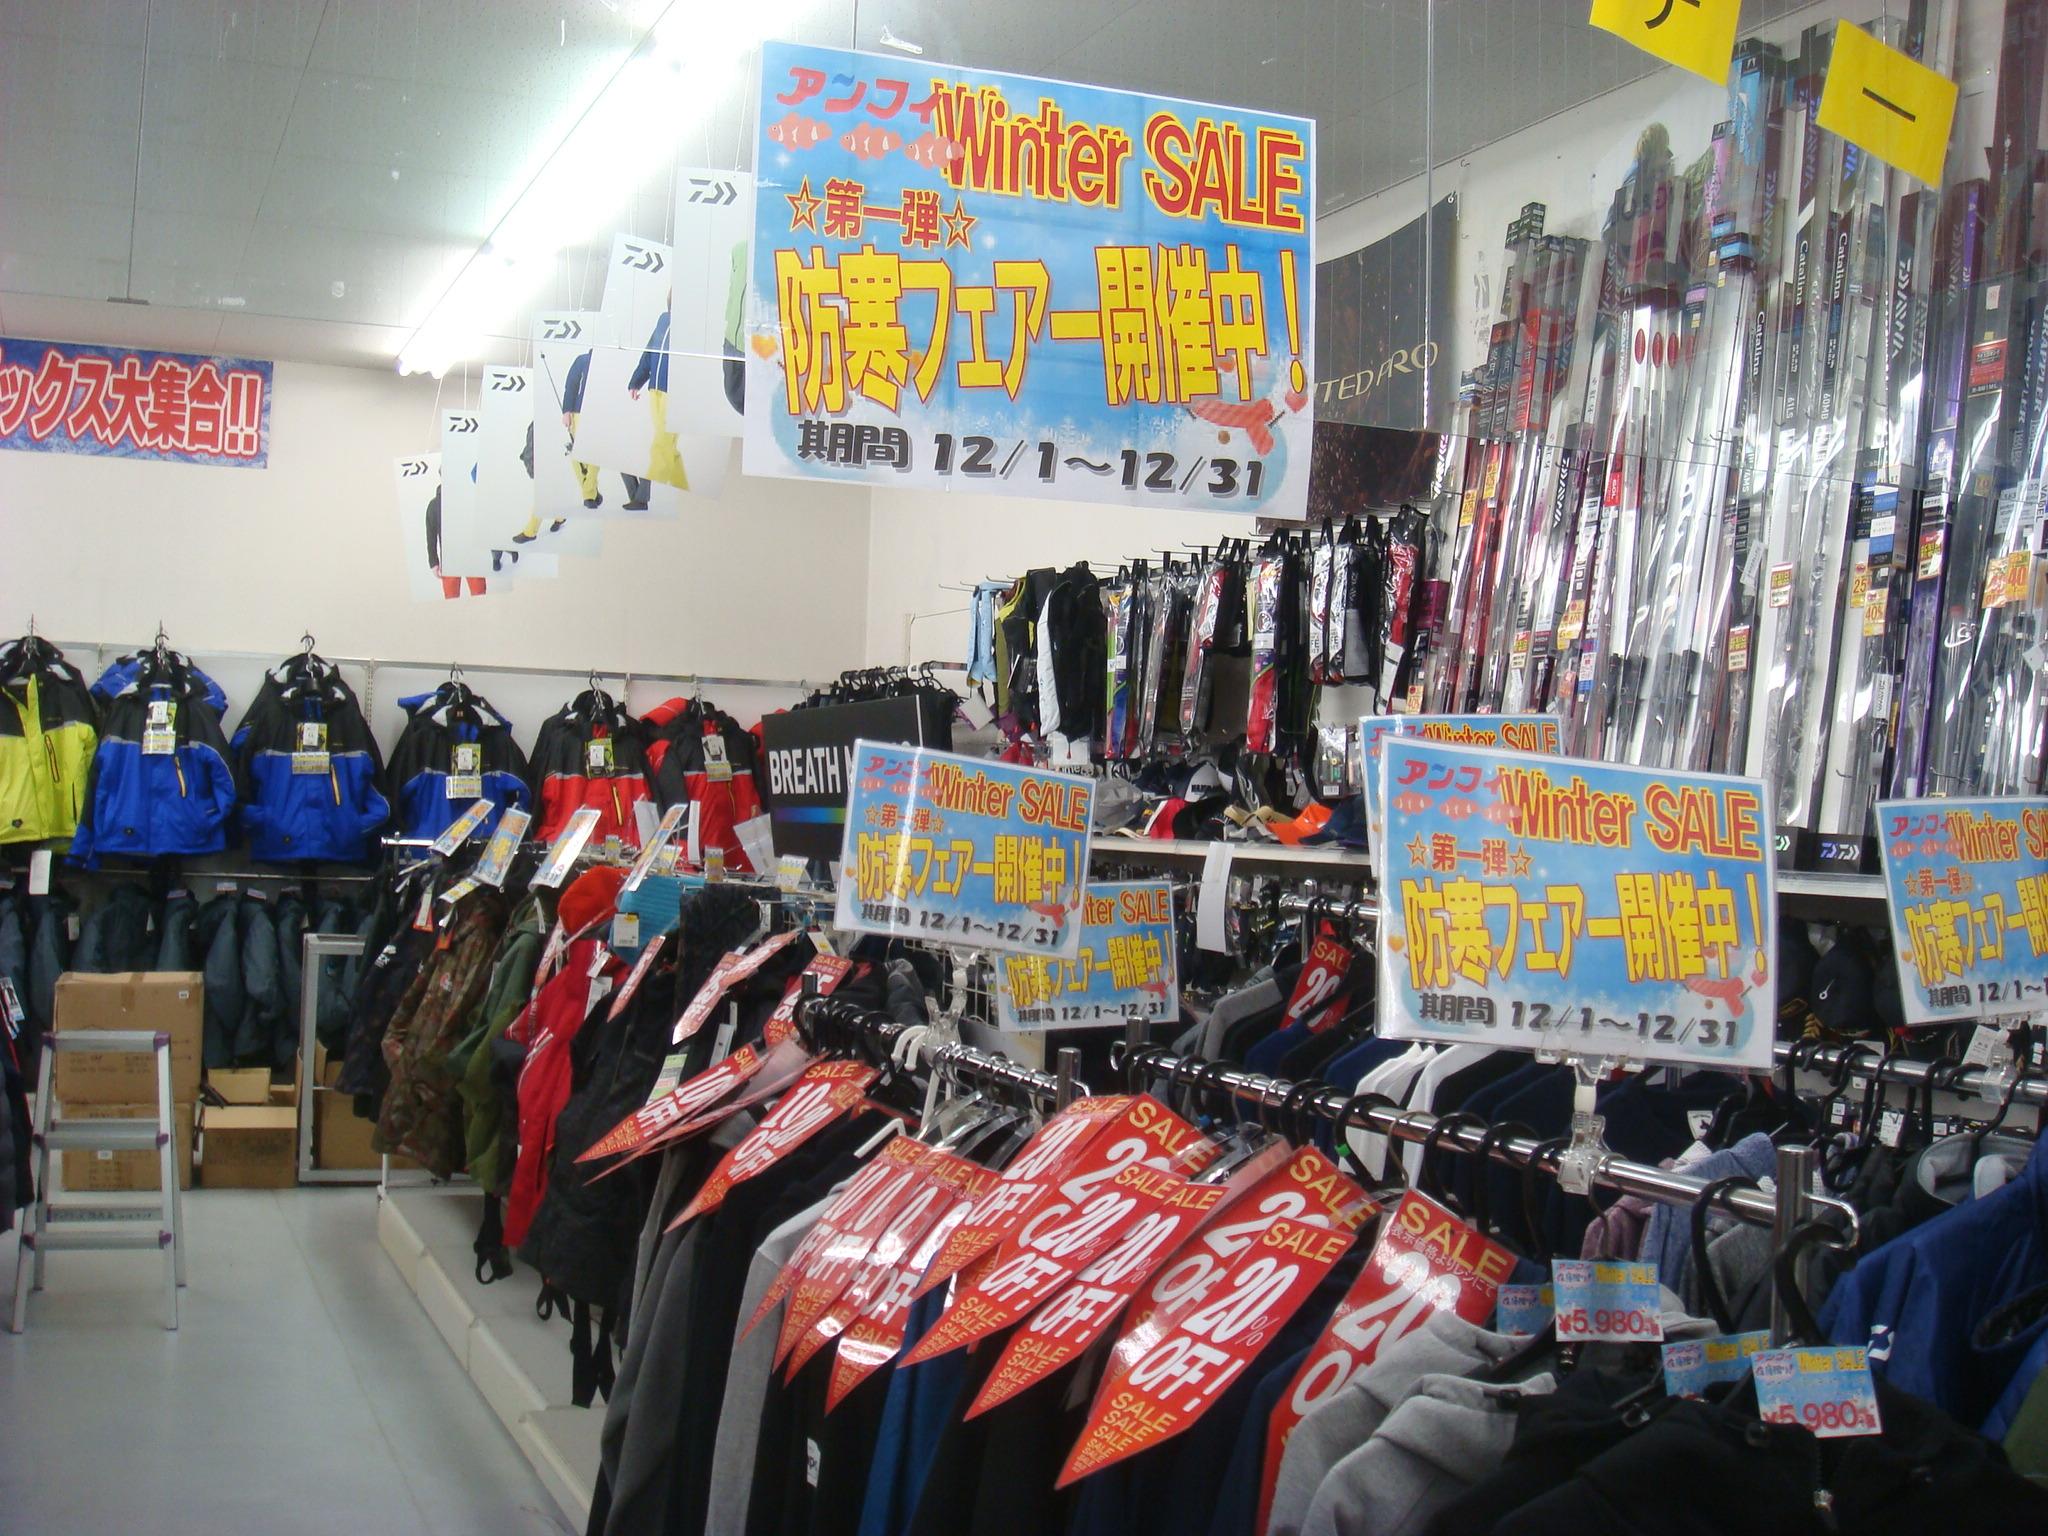 http://www.e-angle.co.jp/shop/blog/DSC02585.JPG